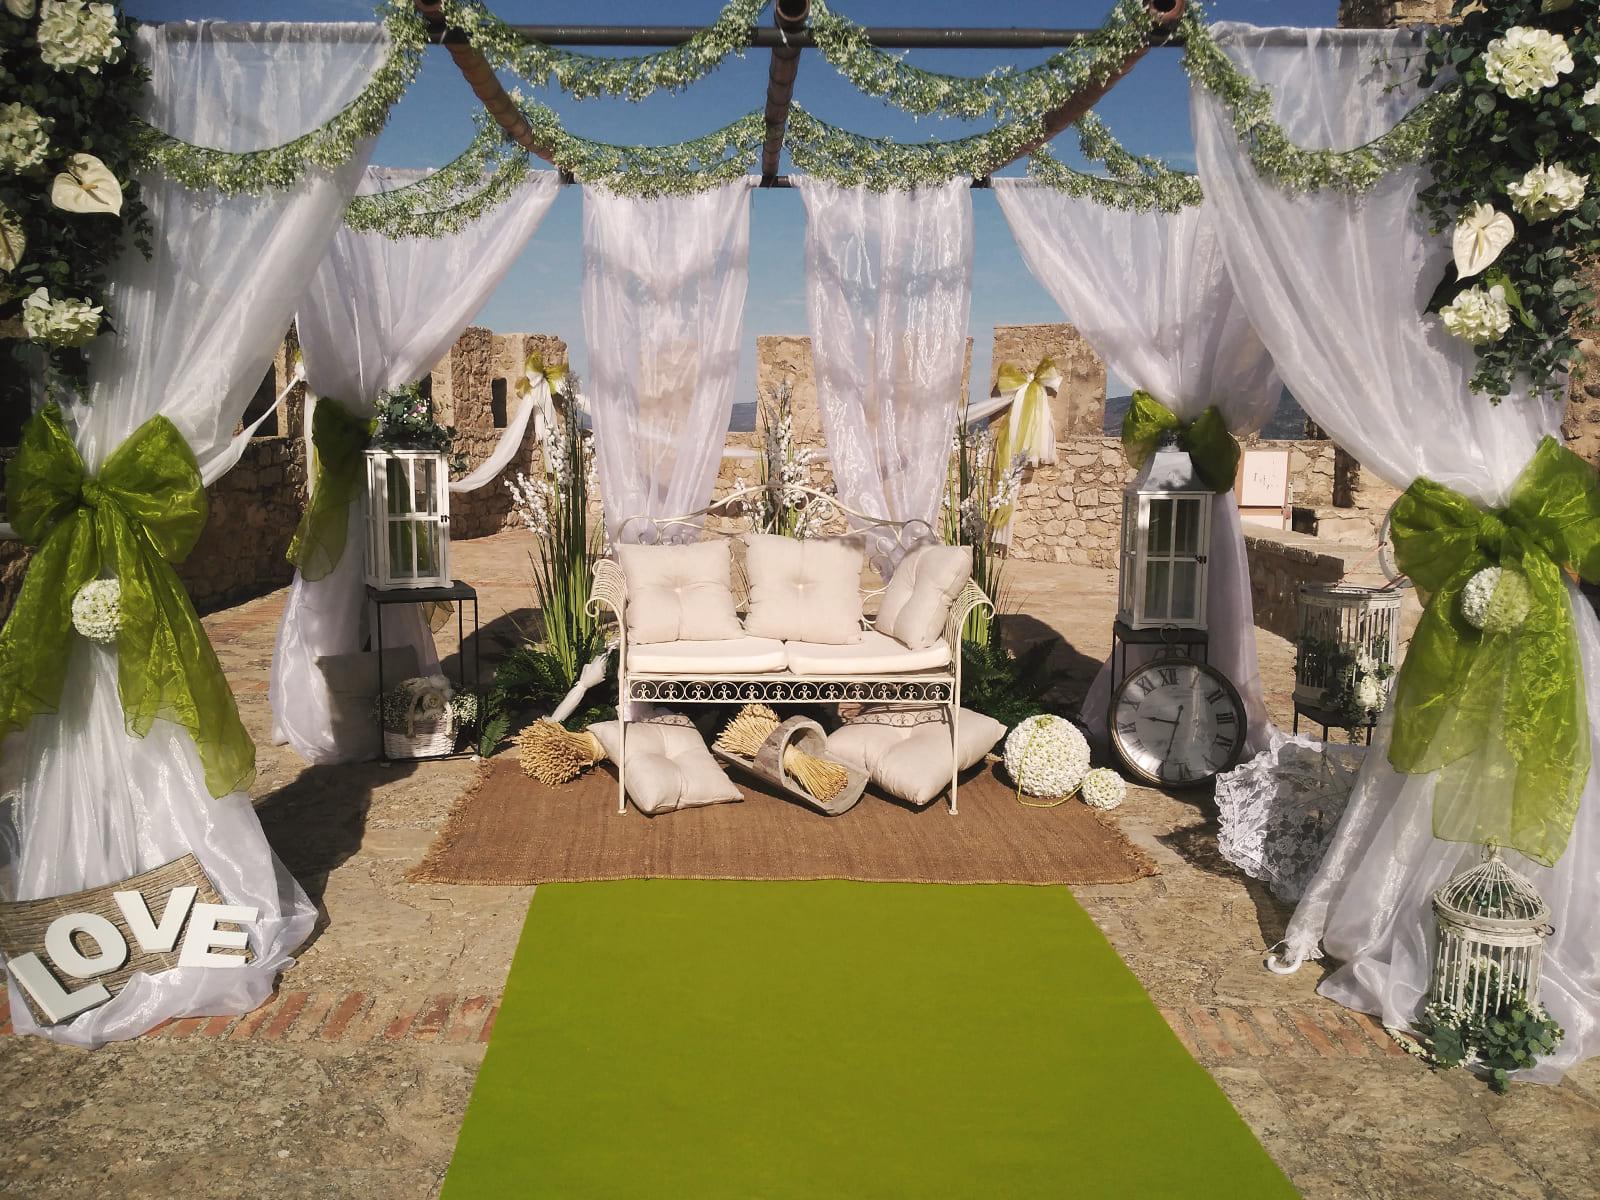 boda-civil-castillo-verde-MS-07_HIDROJARDIN-Bañeres